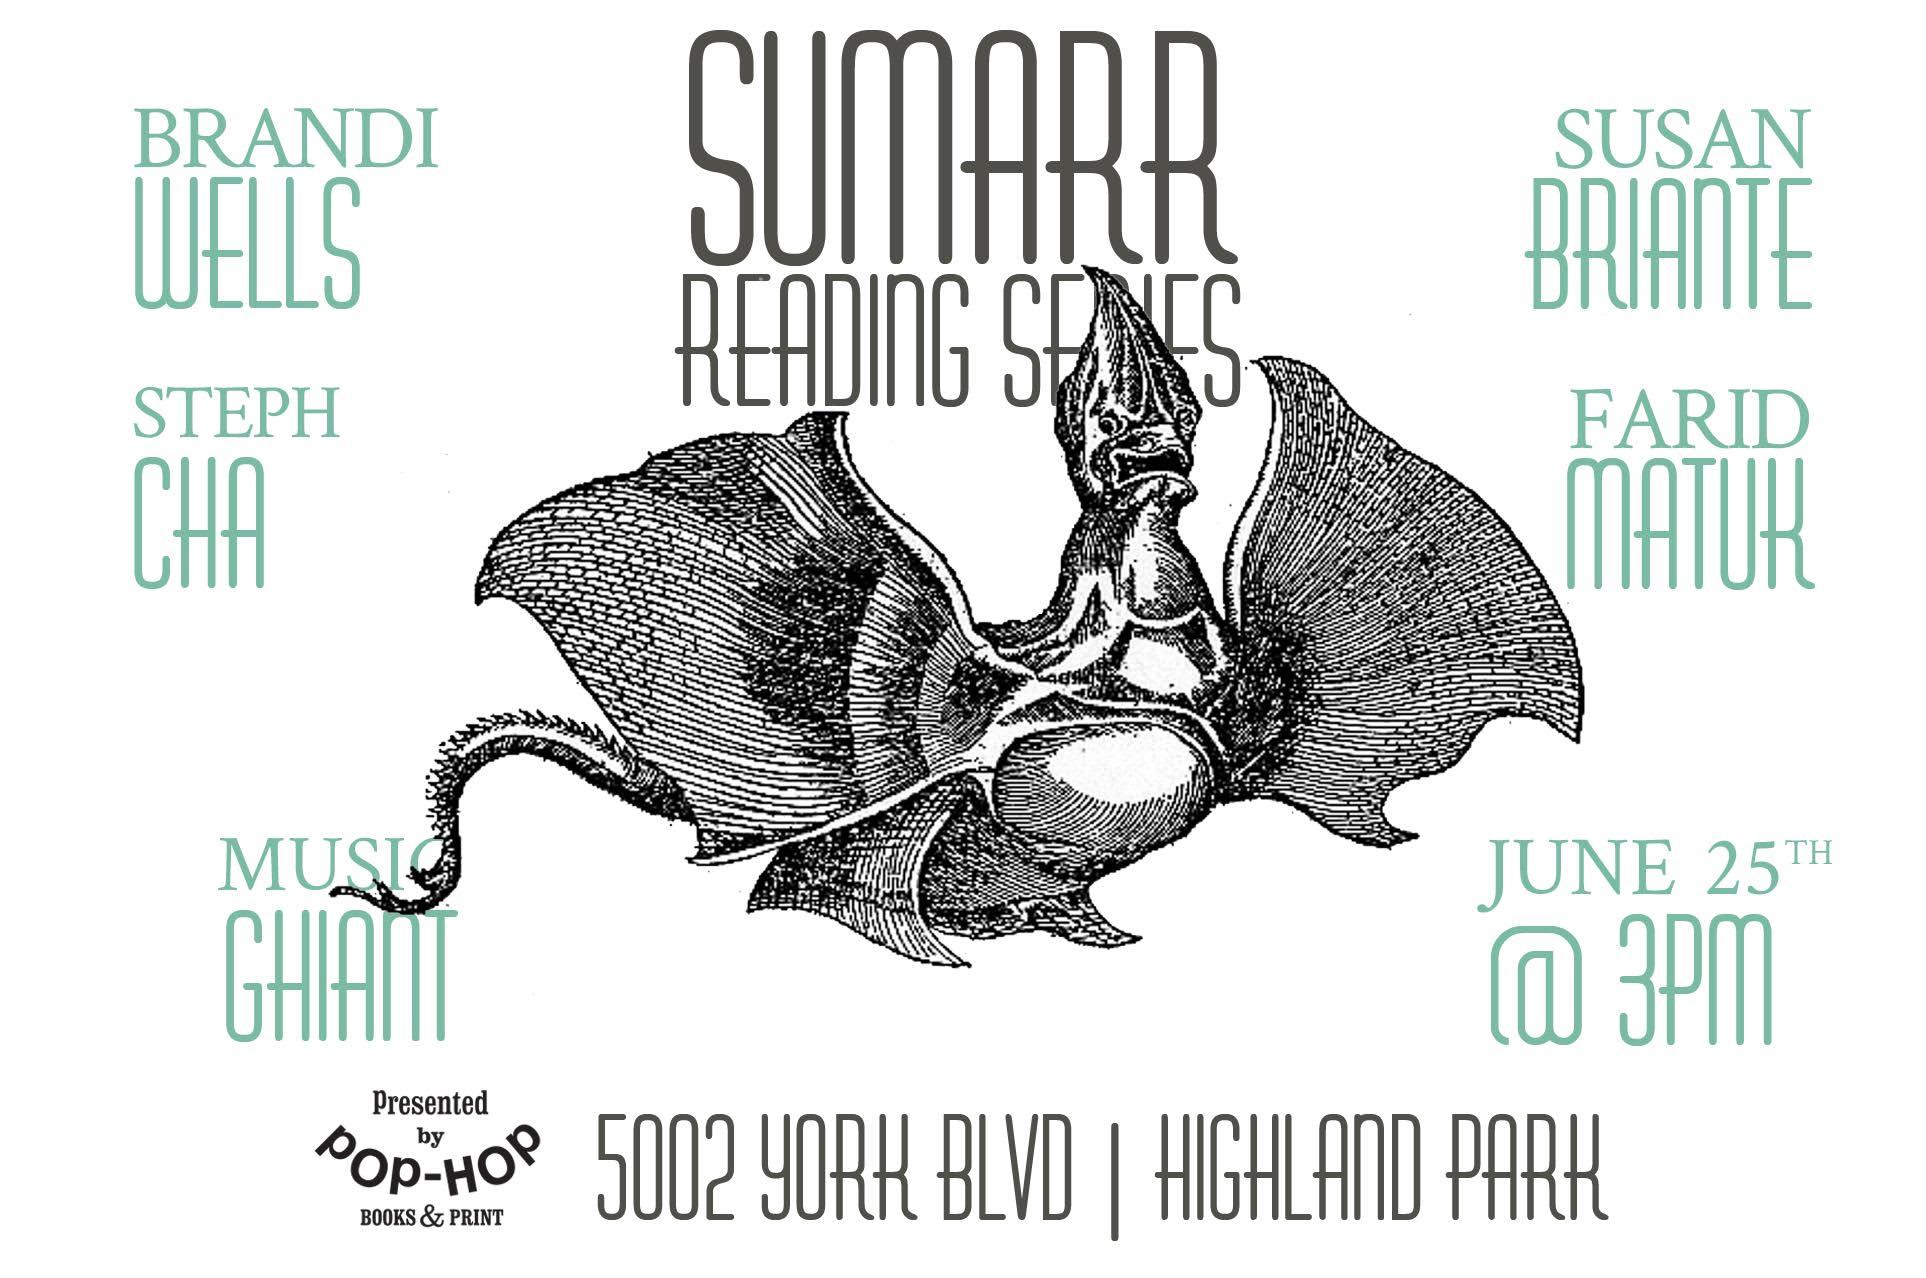 SUMARR: READING SERIES - 06/25/2017